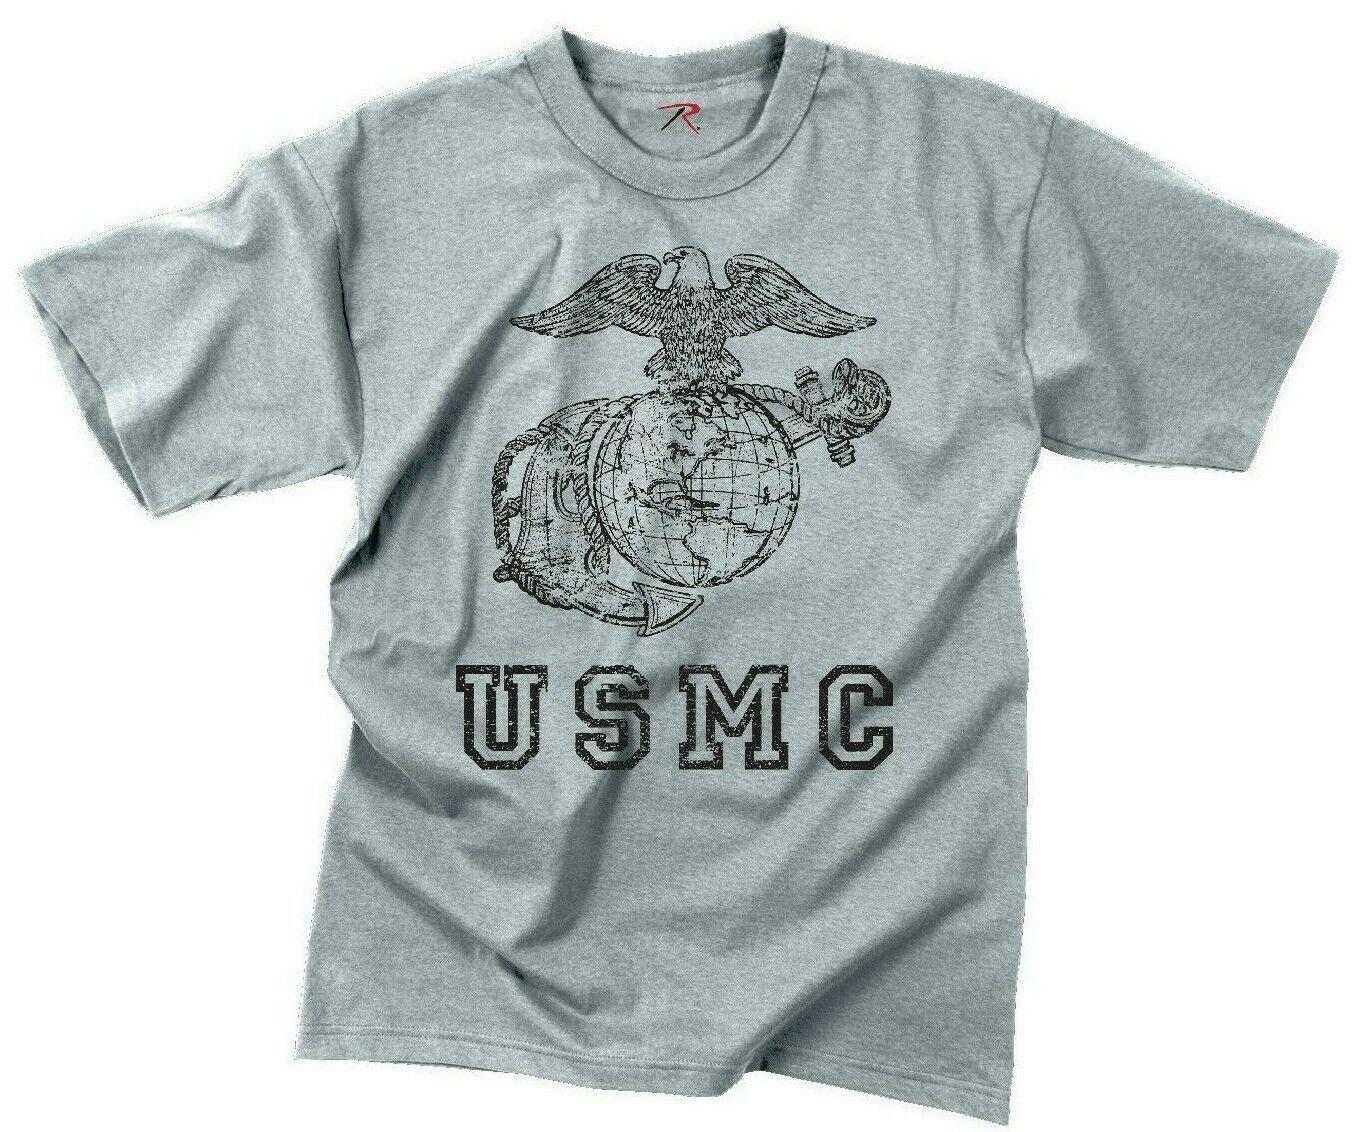 Grey USMC Eagle Globe Anchor T-shirt Marines Marine Corps Tee shirt redhco 61343